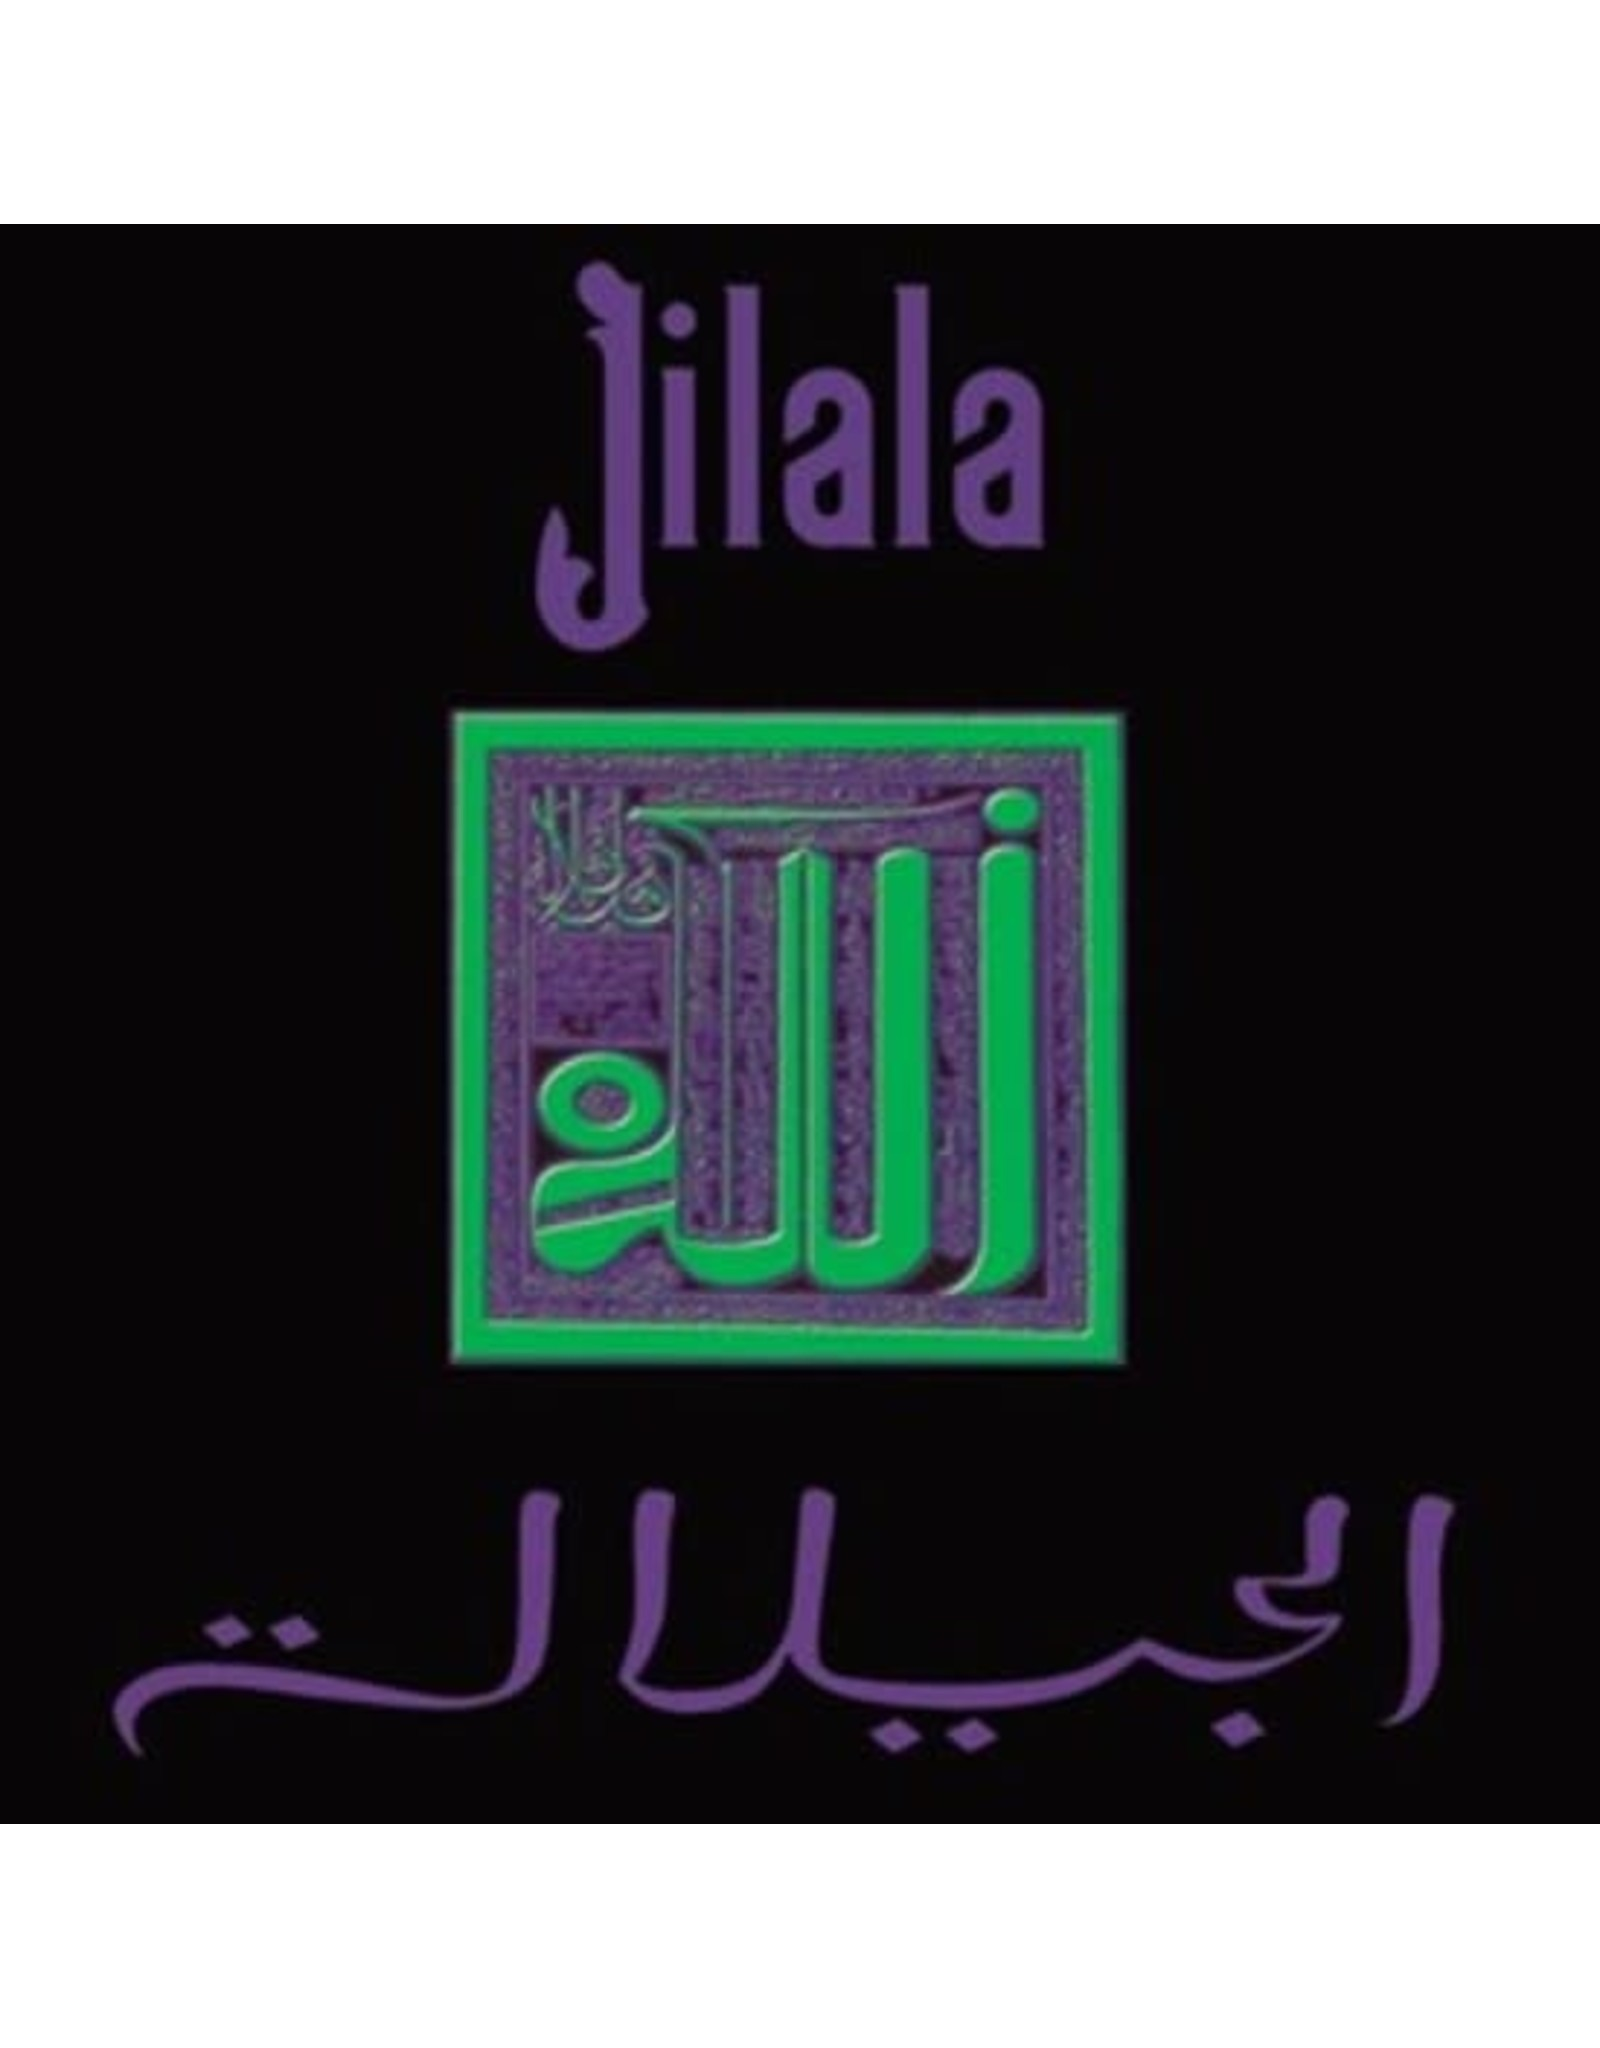 Rogue Frequency Jilala: s/t LP